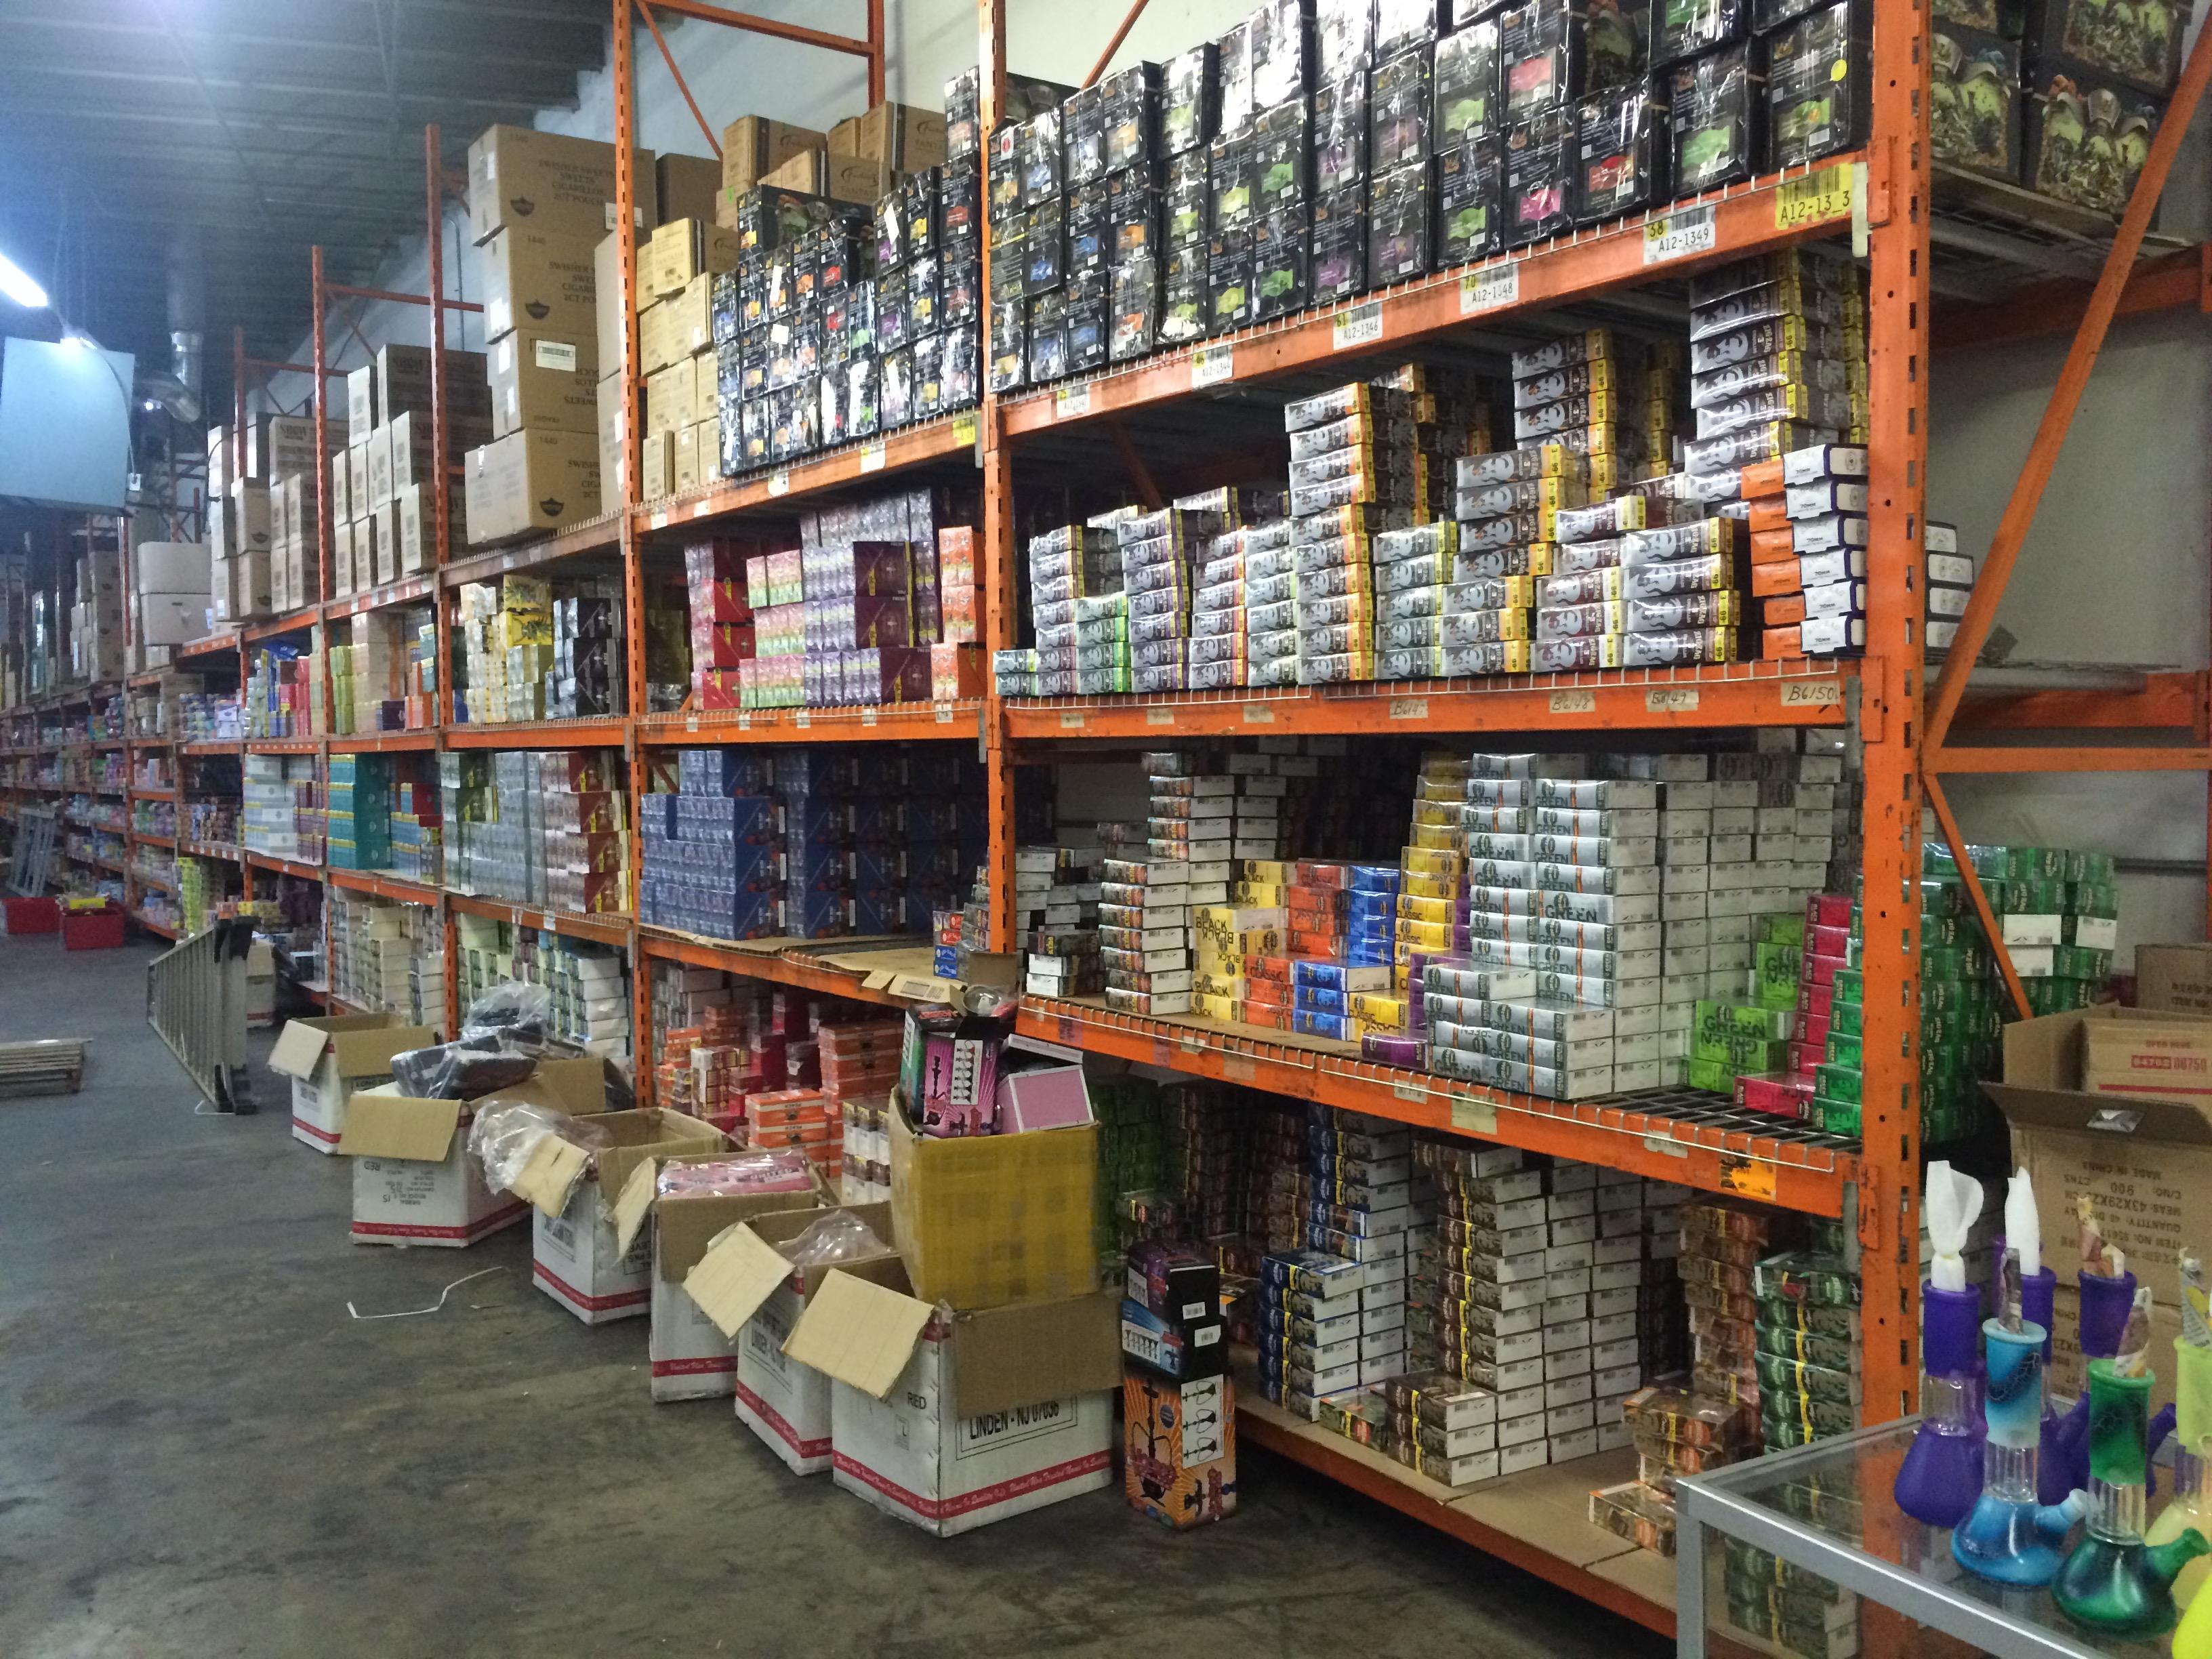 USA Wholesale & Distributing 203 Blount St, Fayetteville, NC